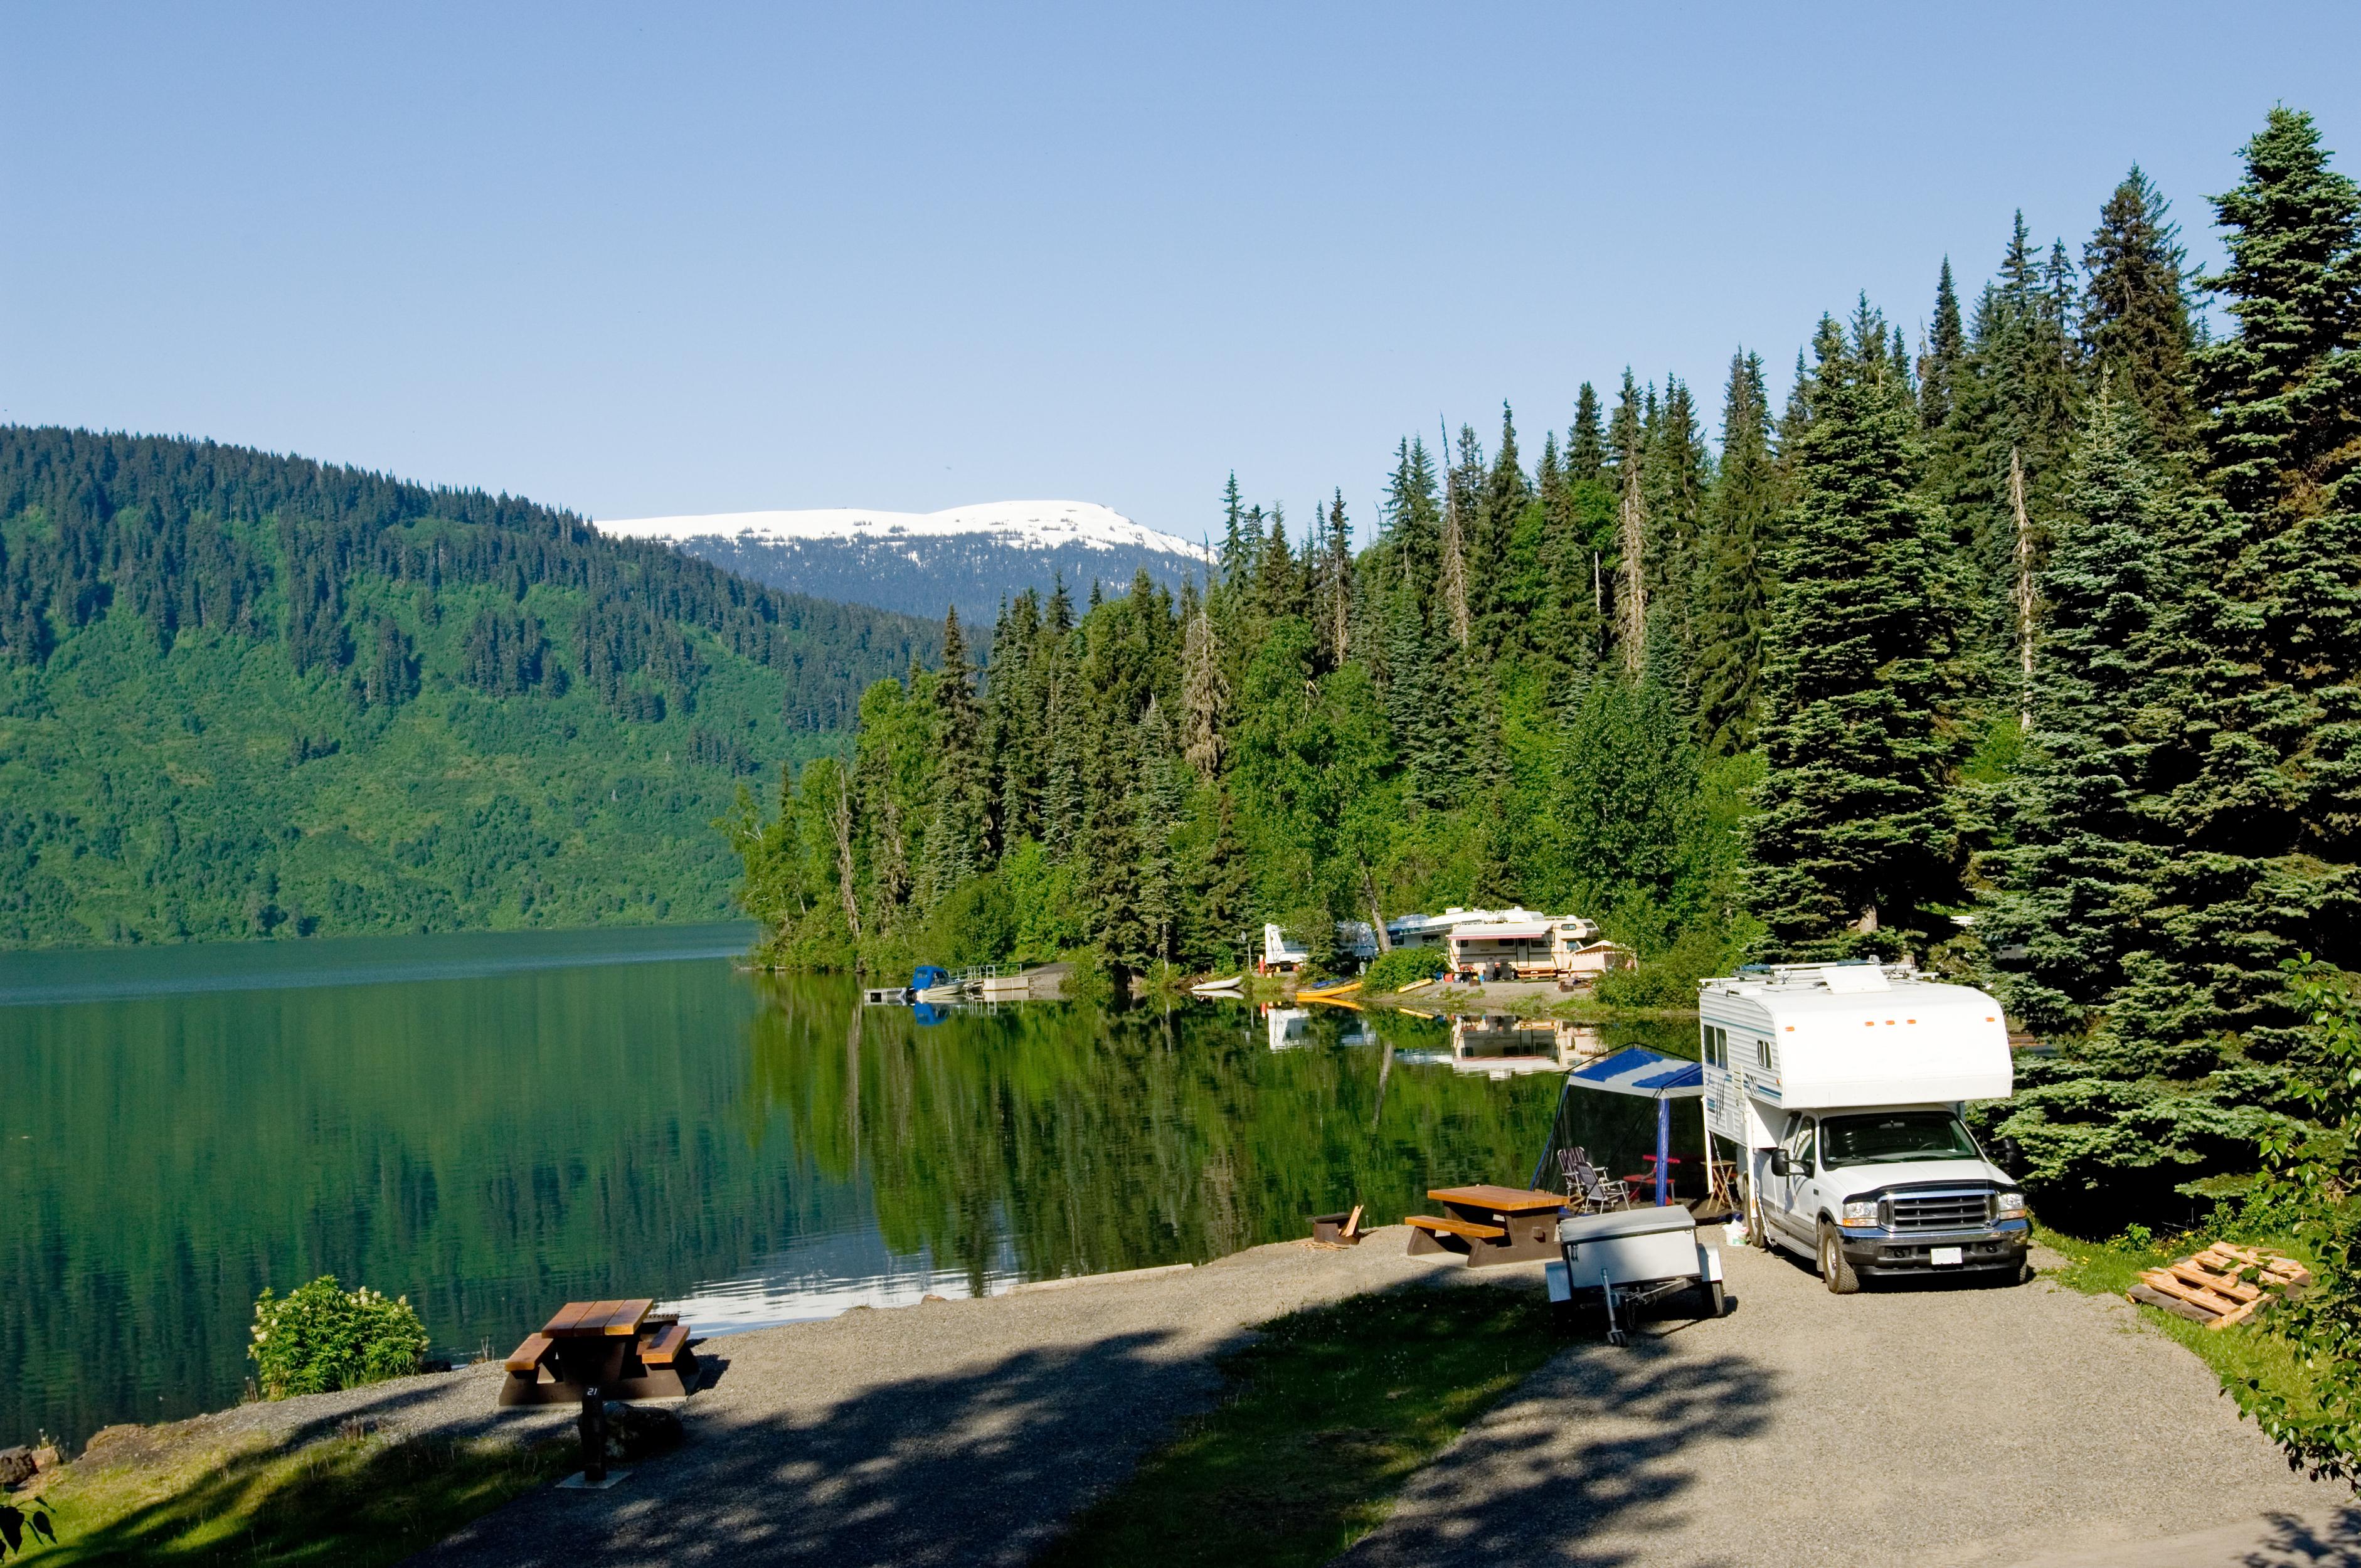 Travel-Mor-Ottawa-RV-on-lake